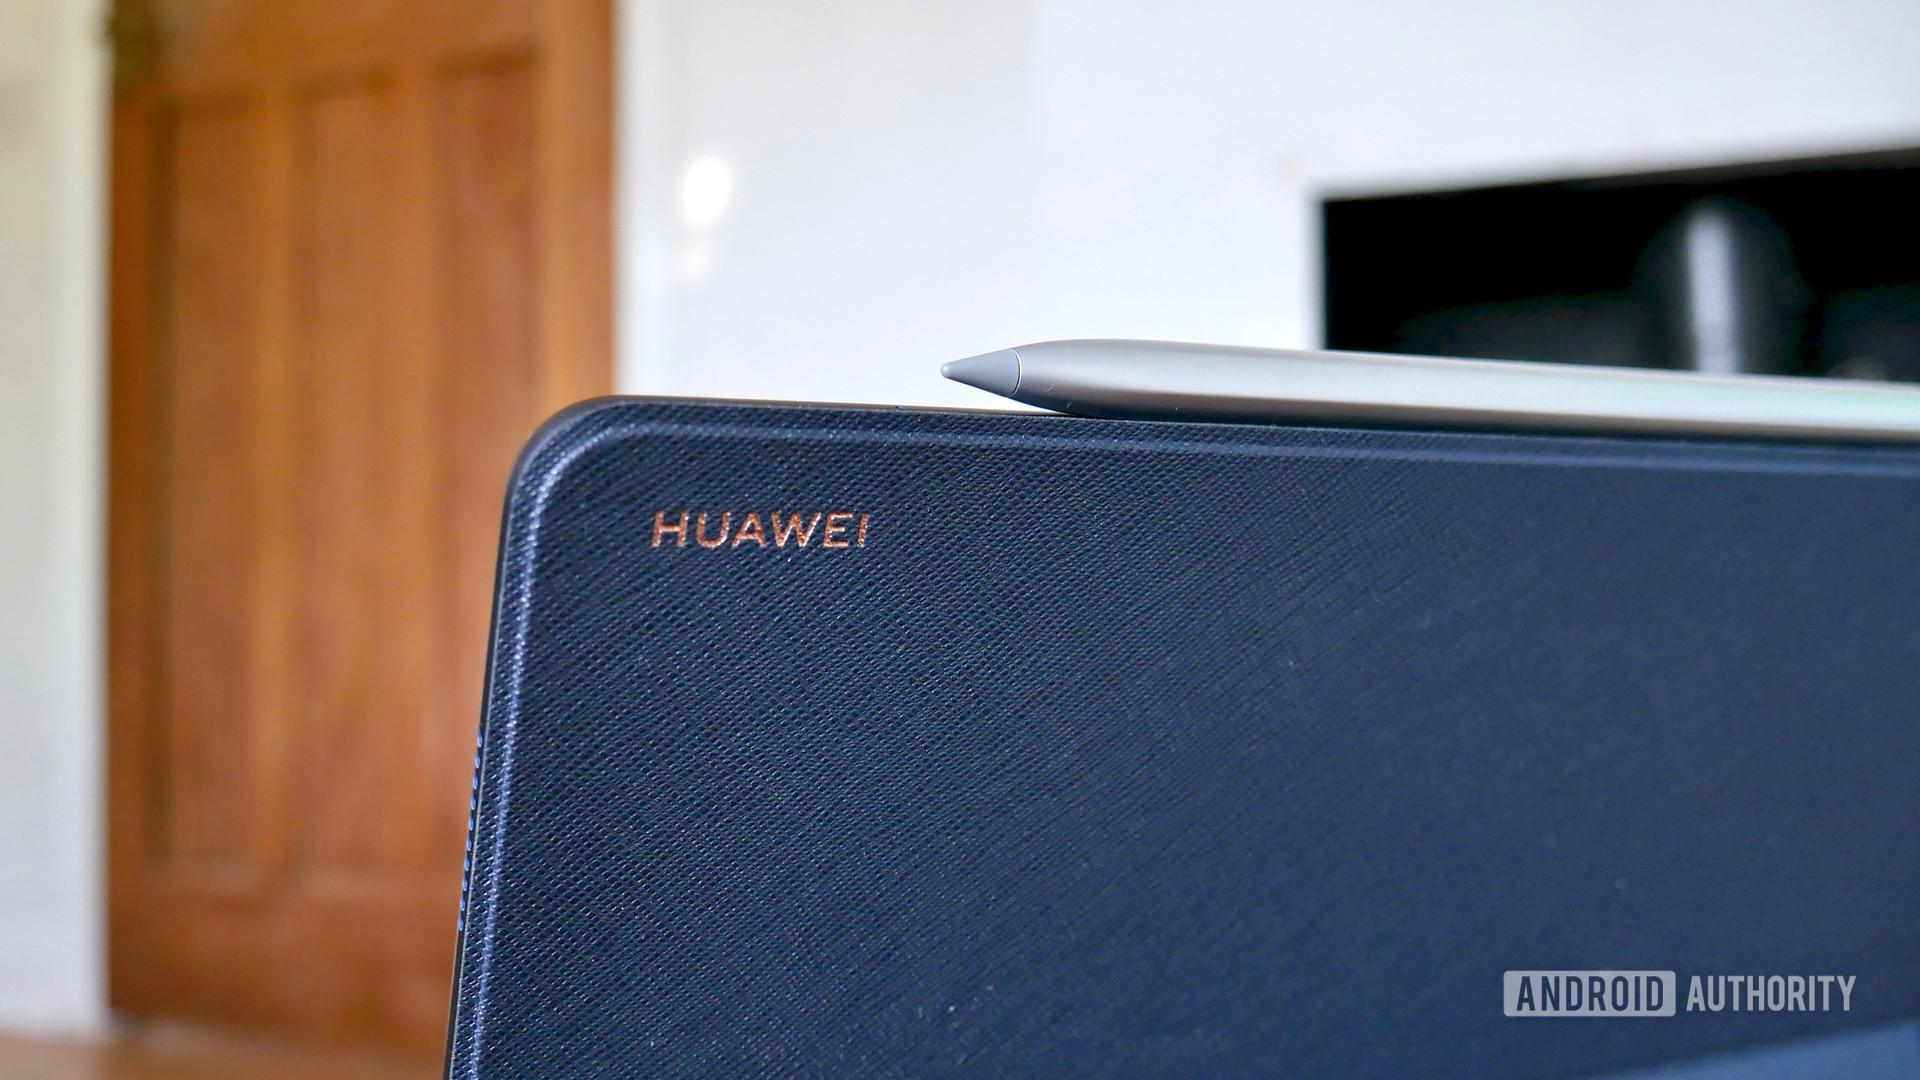 huawei matepad pro review m pencil logo